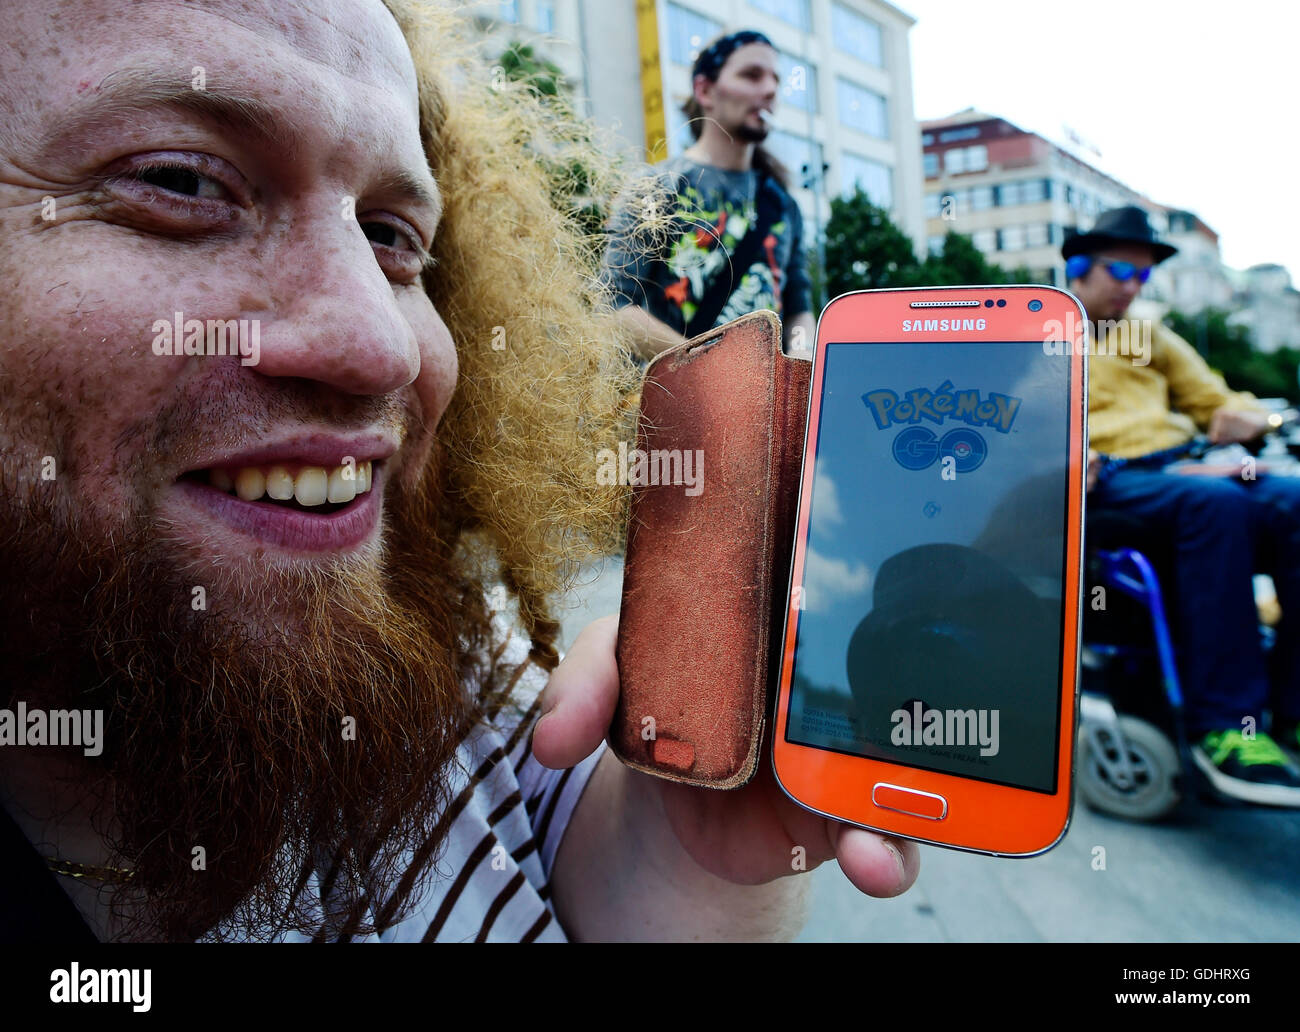 Prague, Czech Republic. 16th July, 2016. About 200 Pokemon Go location based app gamers meet at Prague's Wenceslas Stock Photo